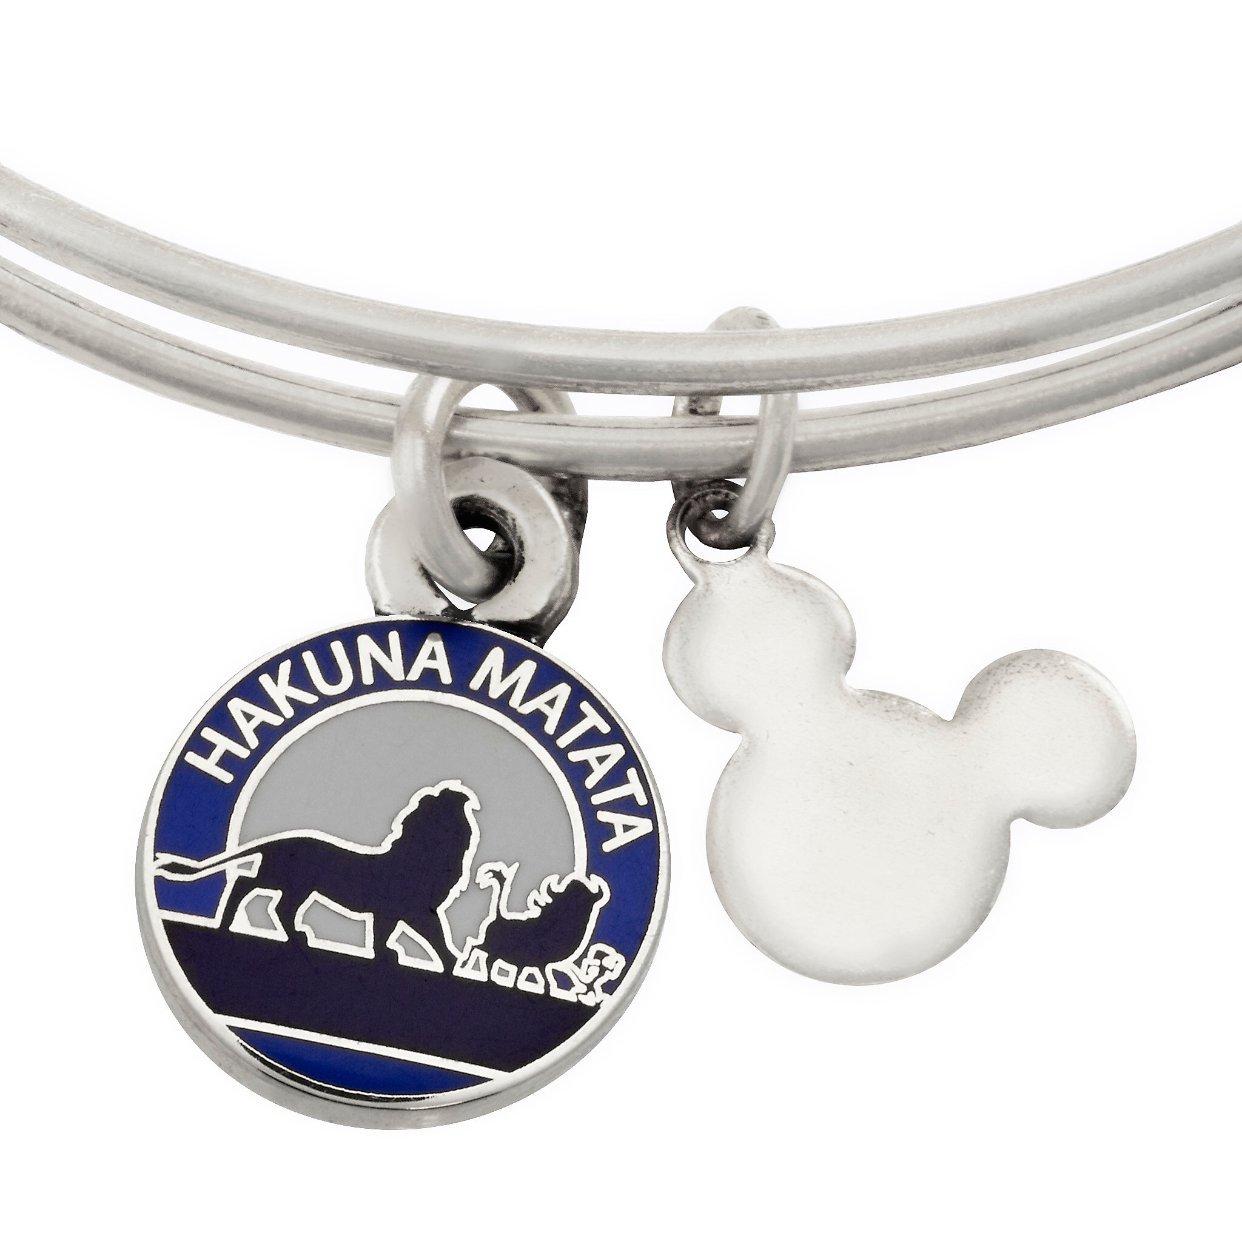 Disney Hakuna Matata Silver Bracelet Image 3